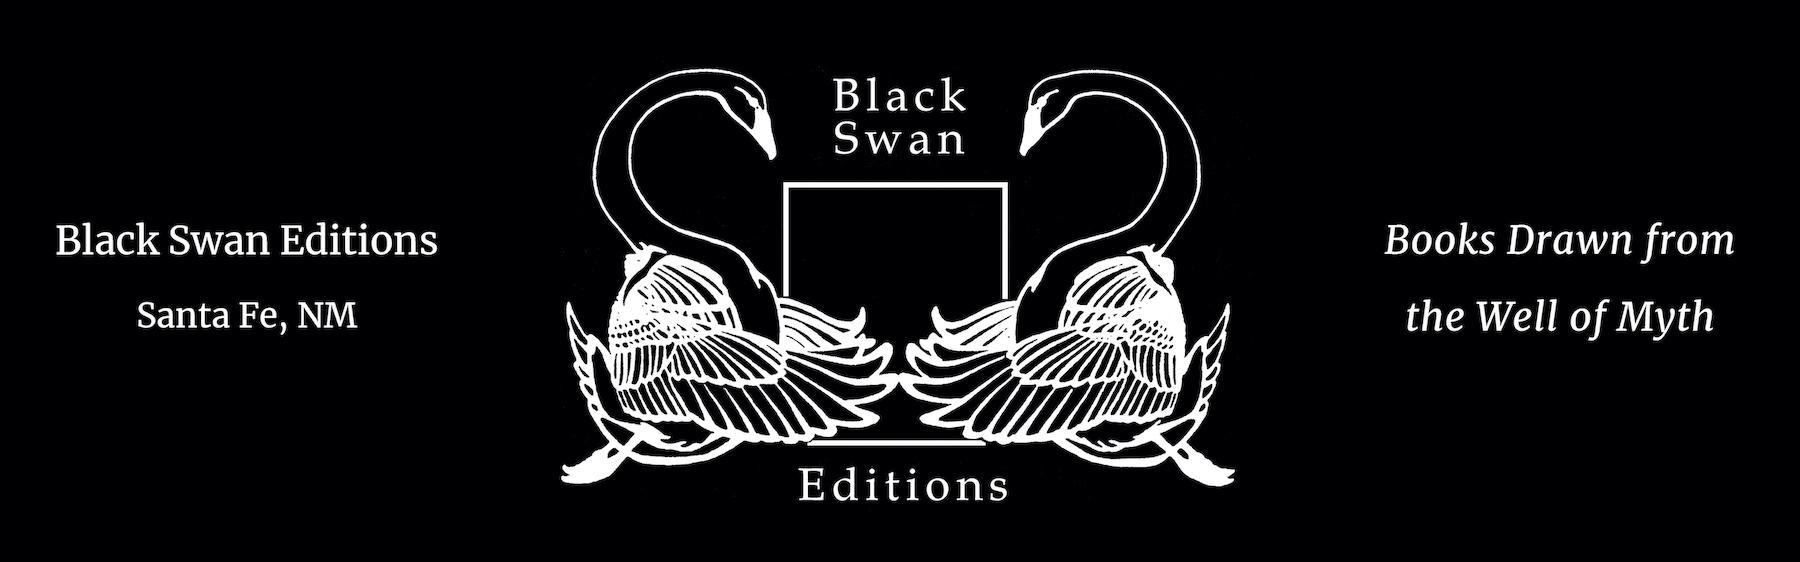 Black Swan Editions